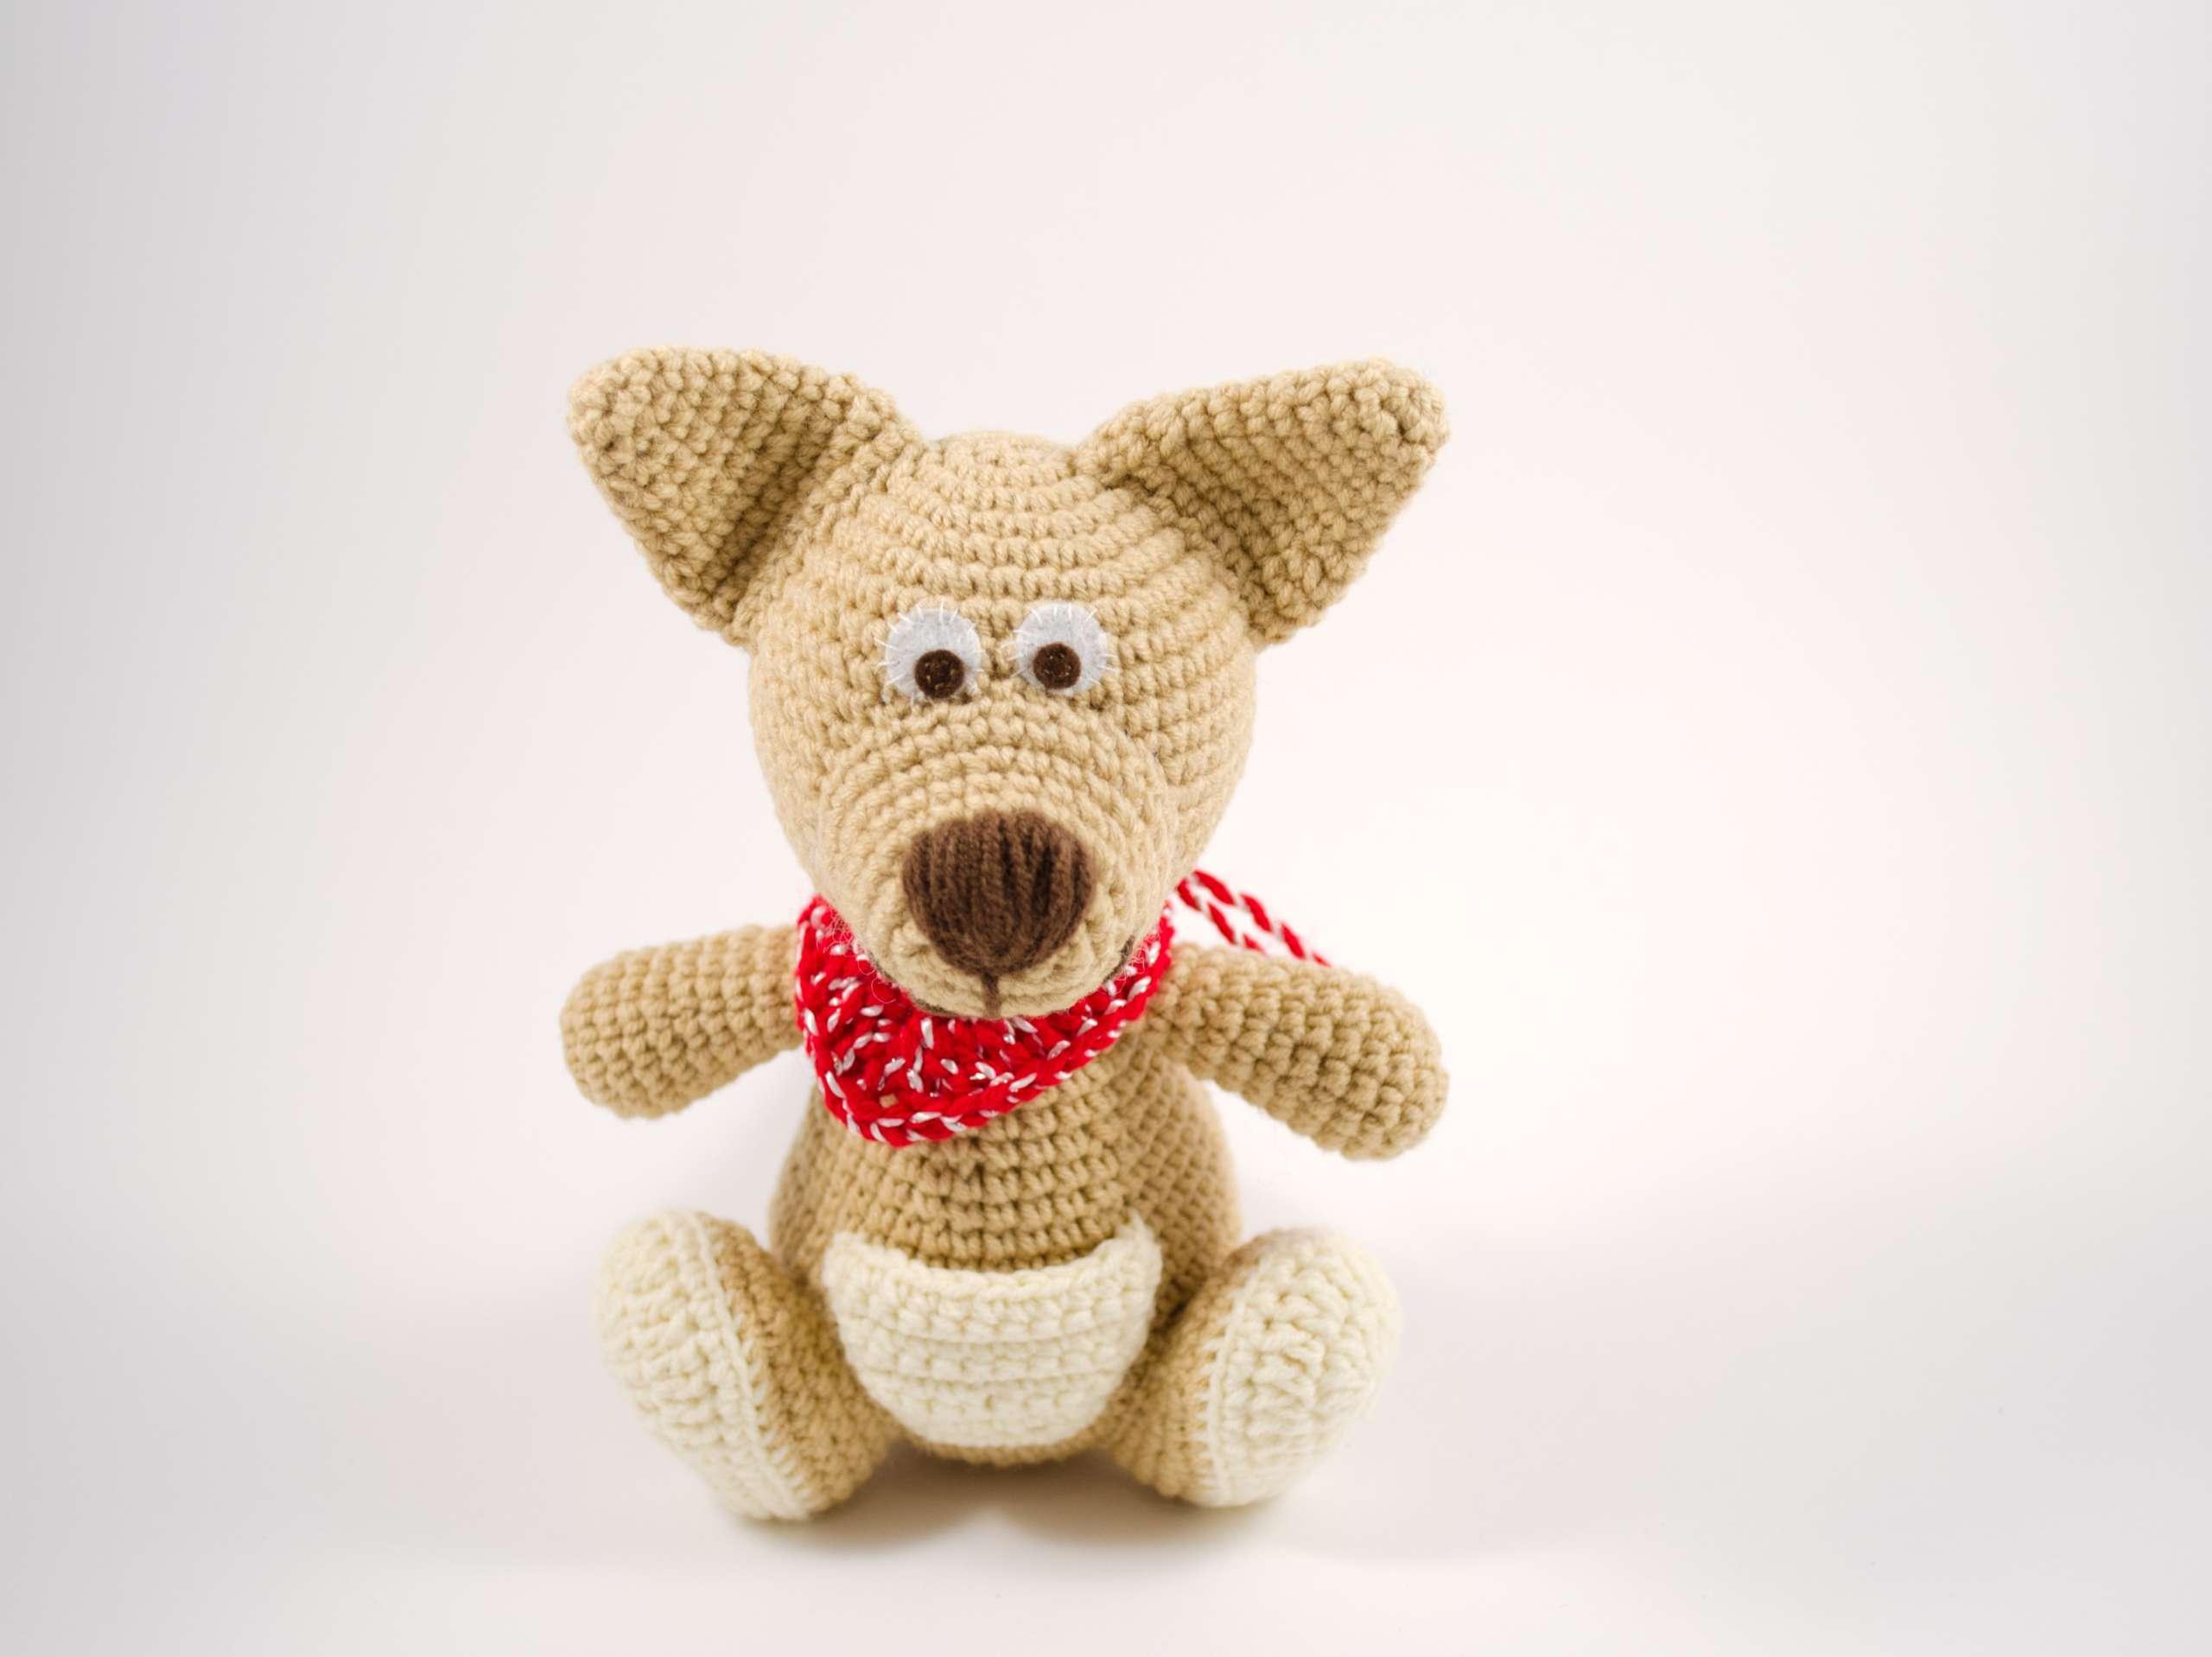 crochet brown kangaroo front view